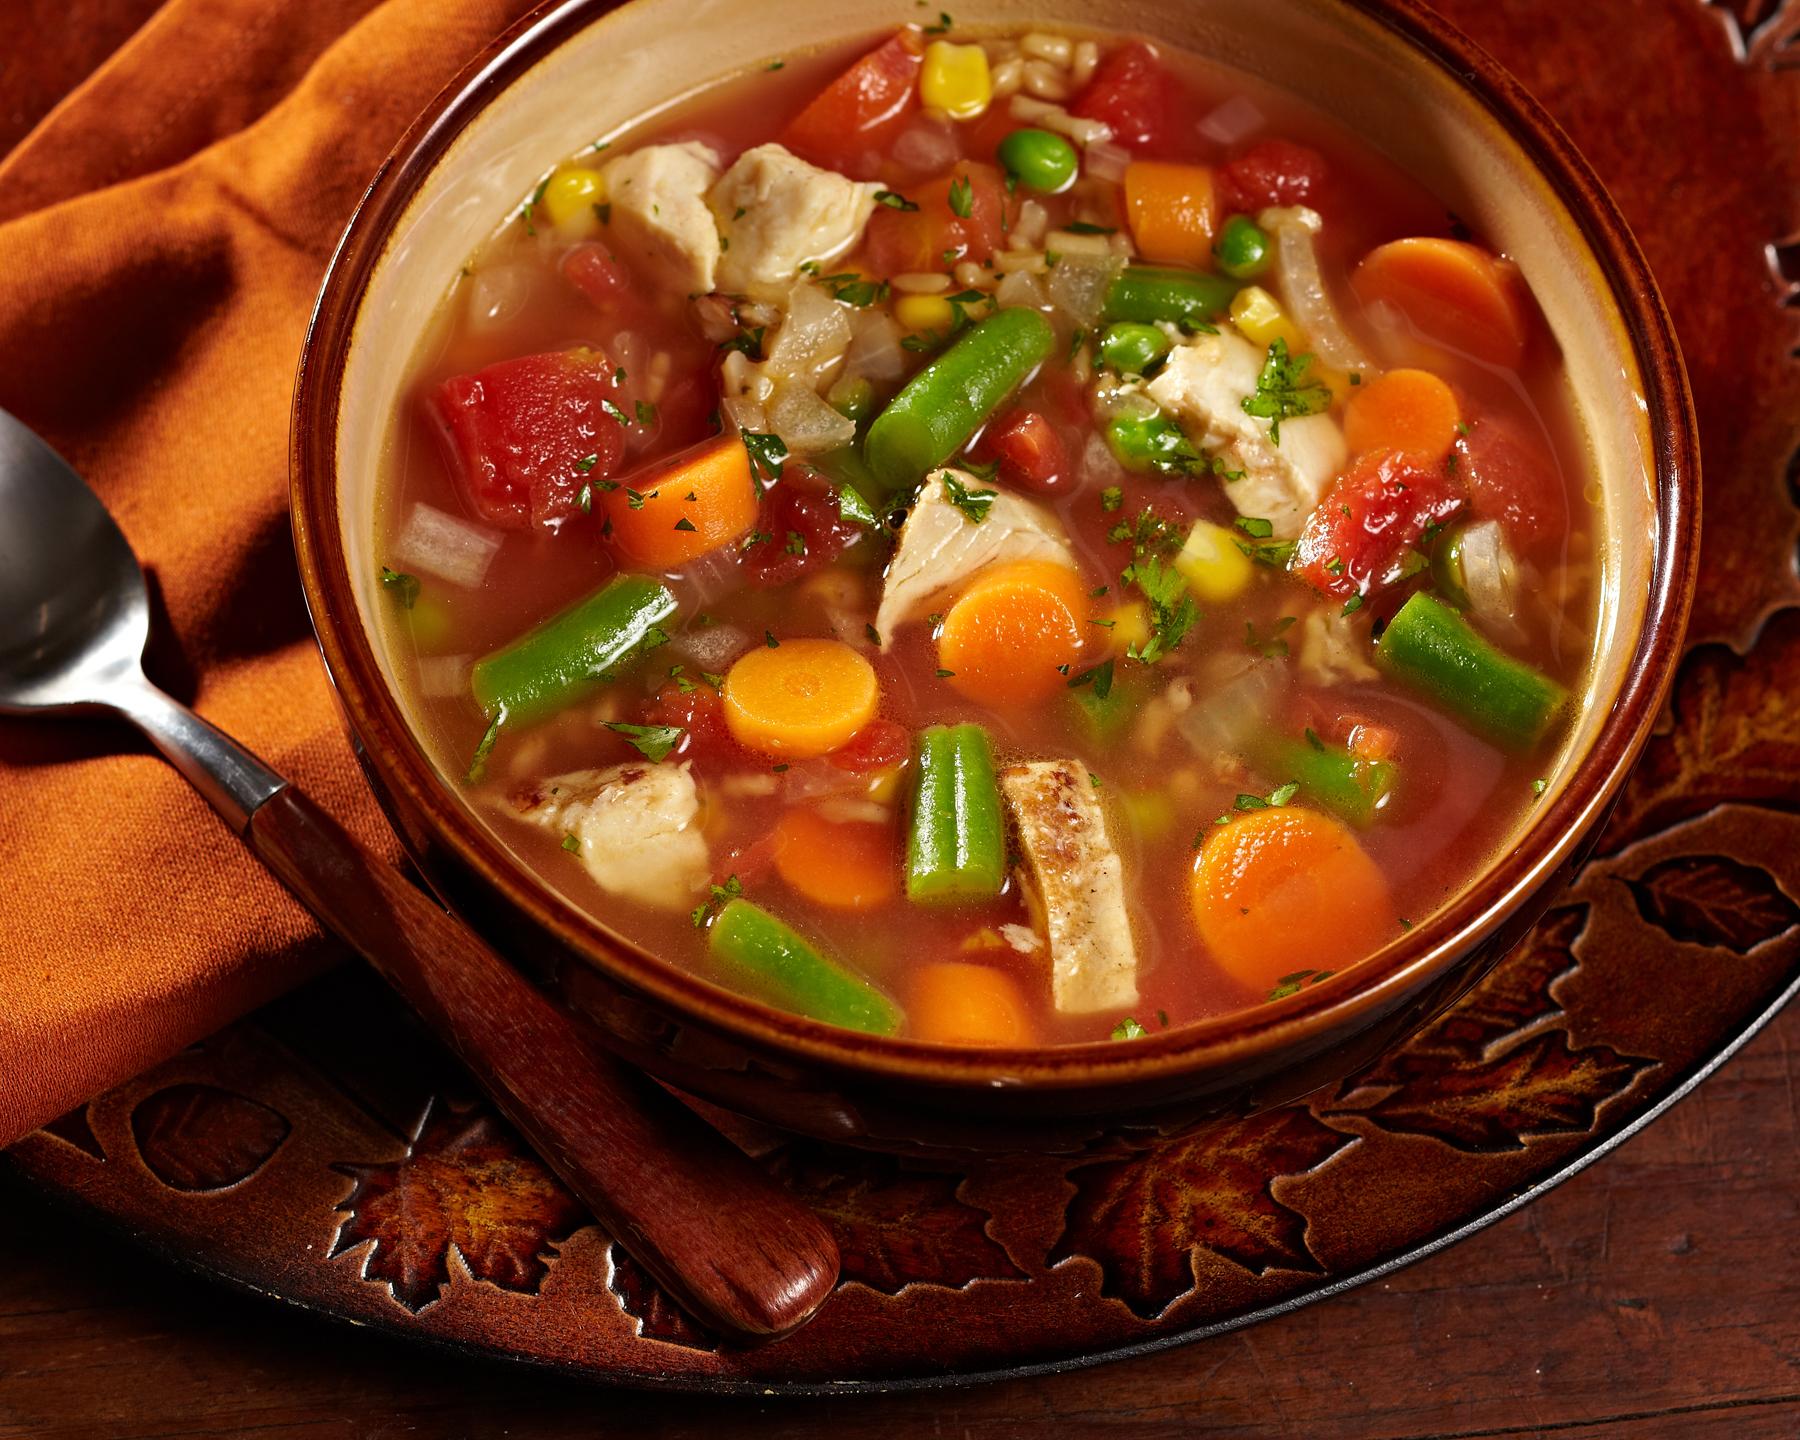 Birds Eye Chicken Vegetable Soup